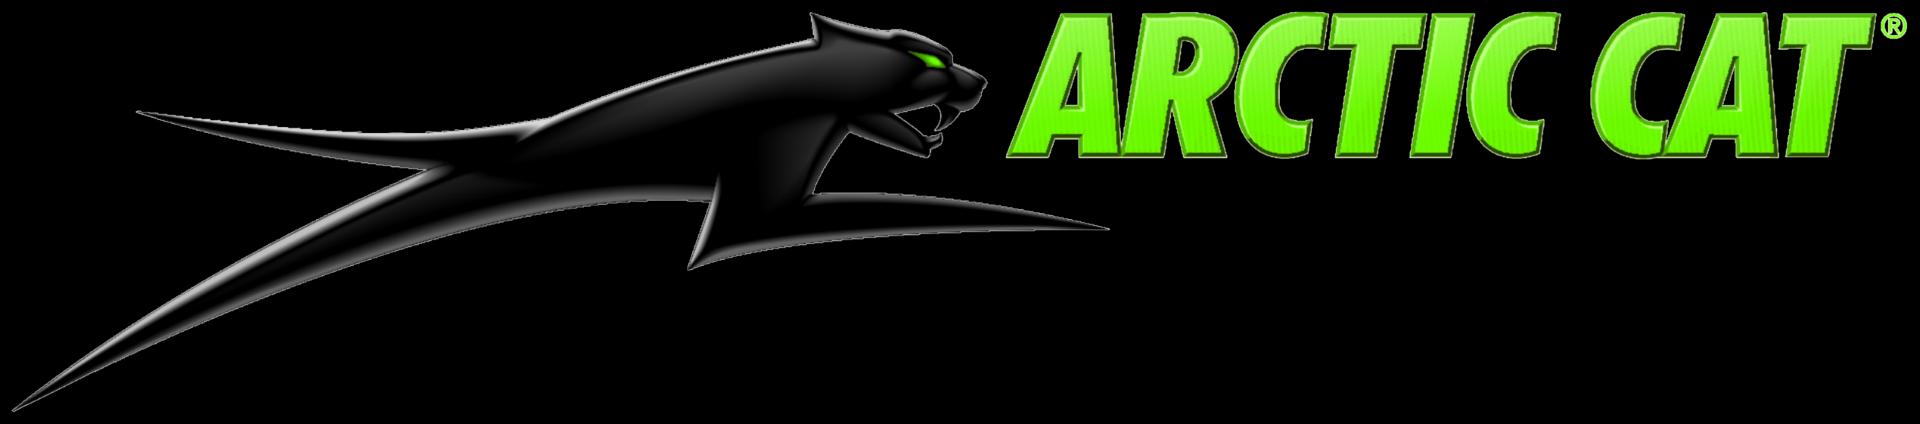 Arctic cat Logos.